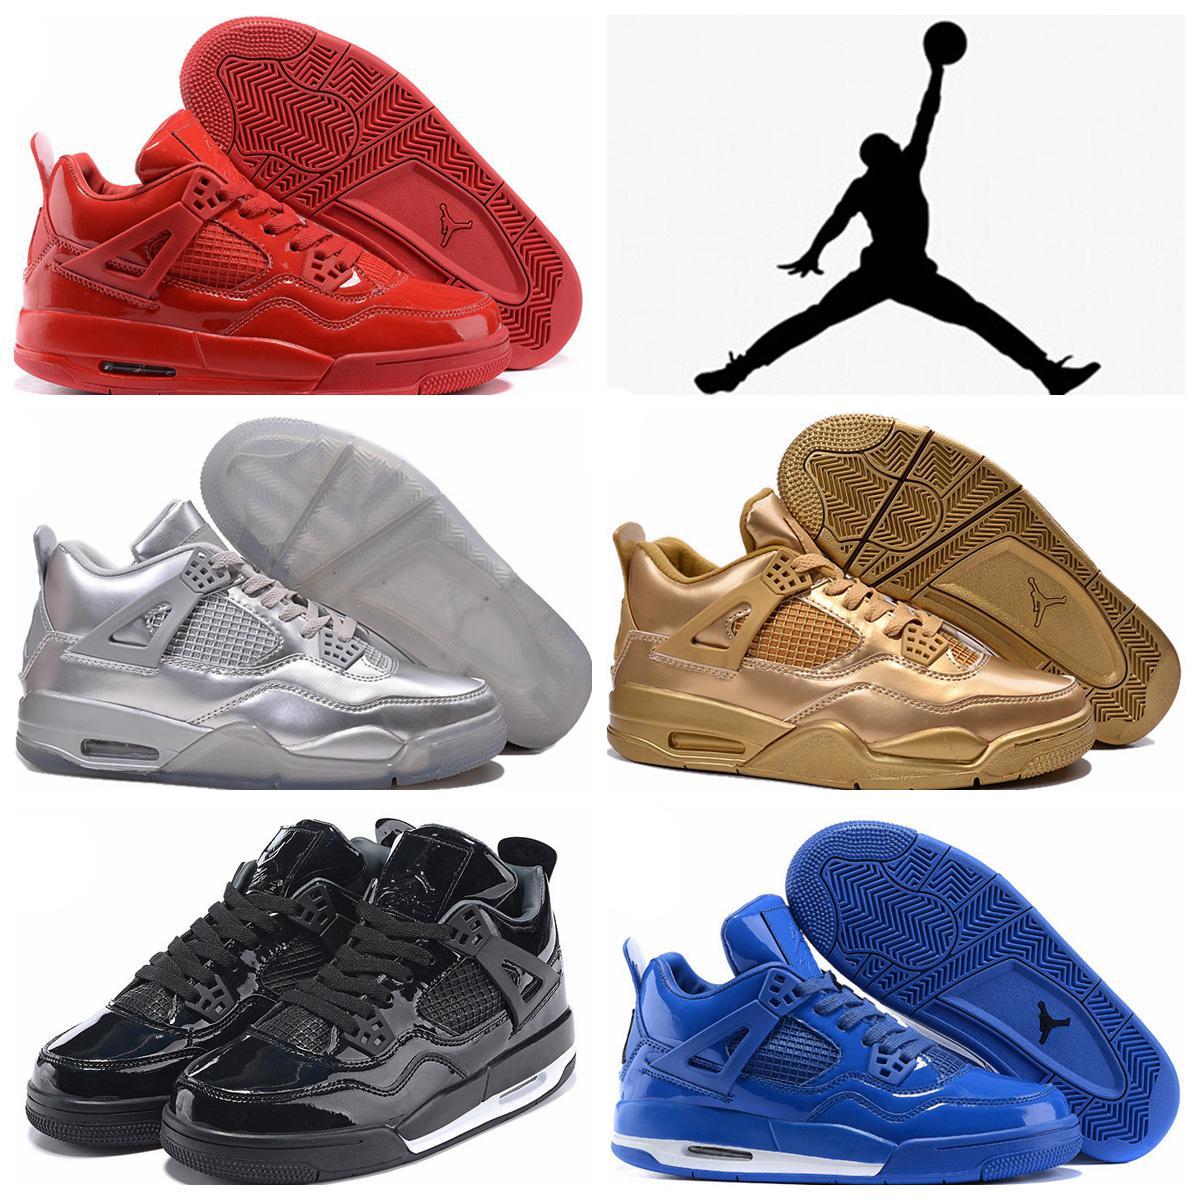 finest selection eb306 e86e5 Großhandel 2016 Nike Air Jordan 4 Herren Basketball Schuhe, Rote Preiswerte  Qualitäts Sport Schuh Discount Breath Jogging Turnschuhe Eur 41 47free  Versand ...